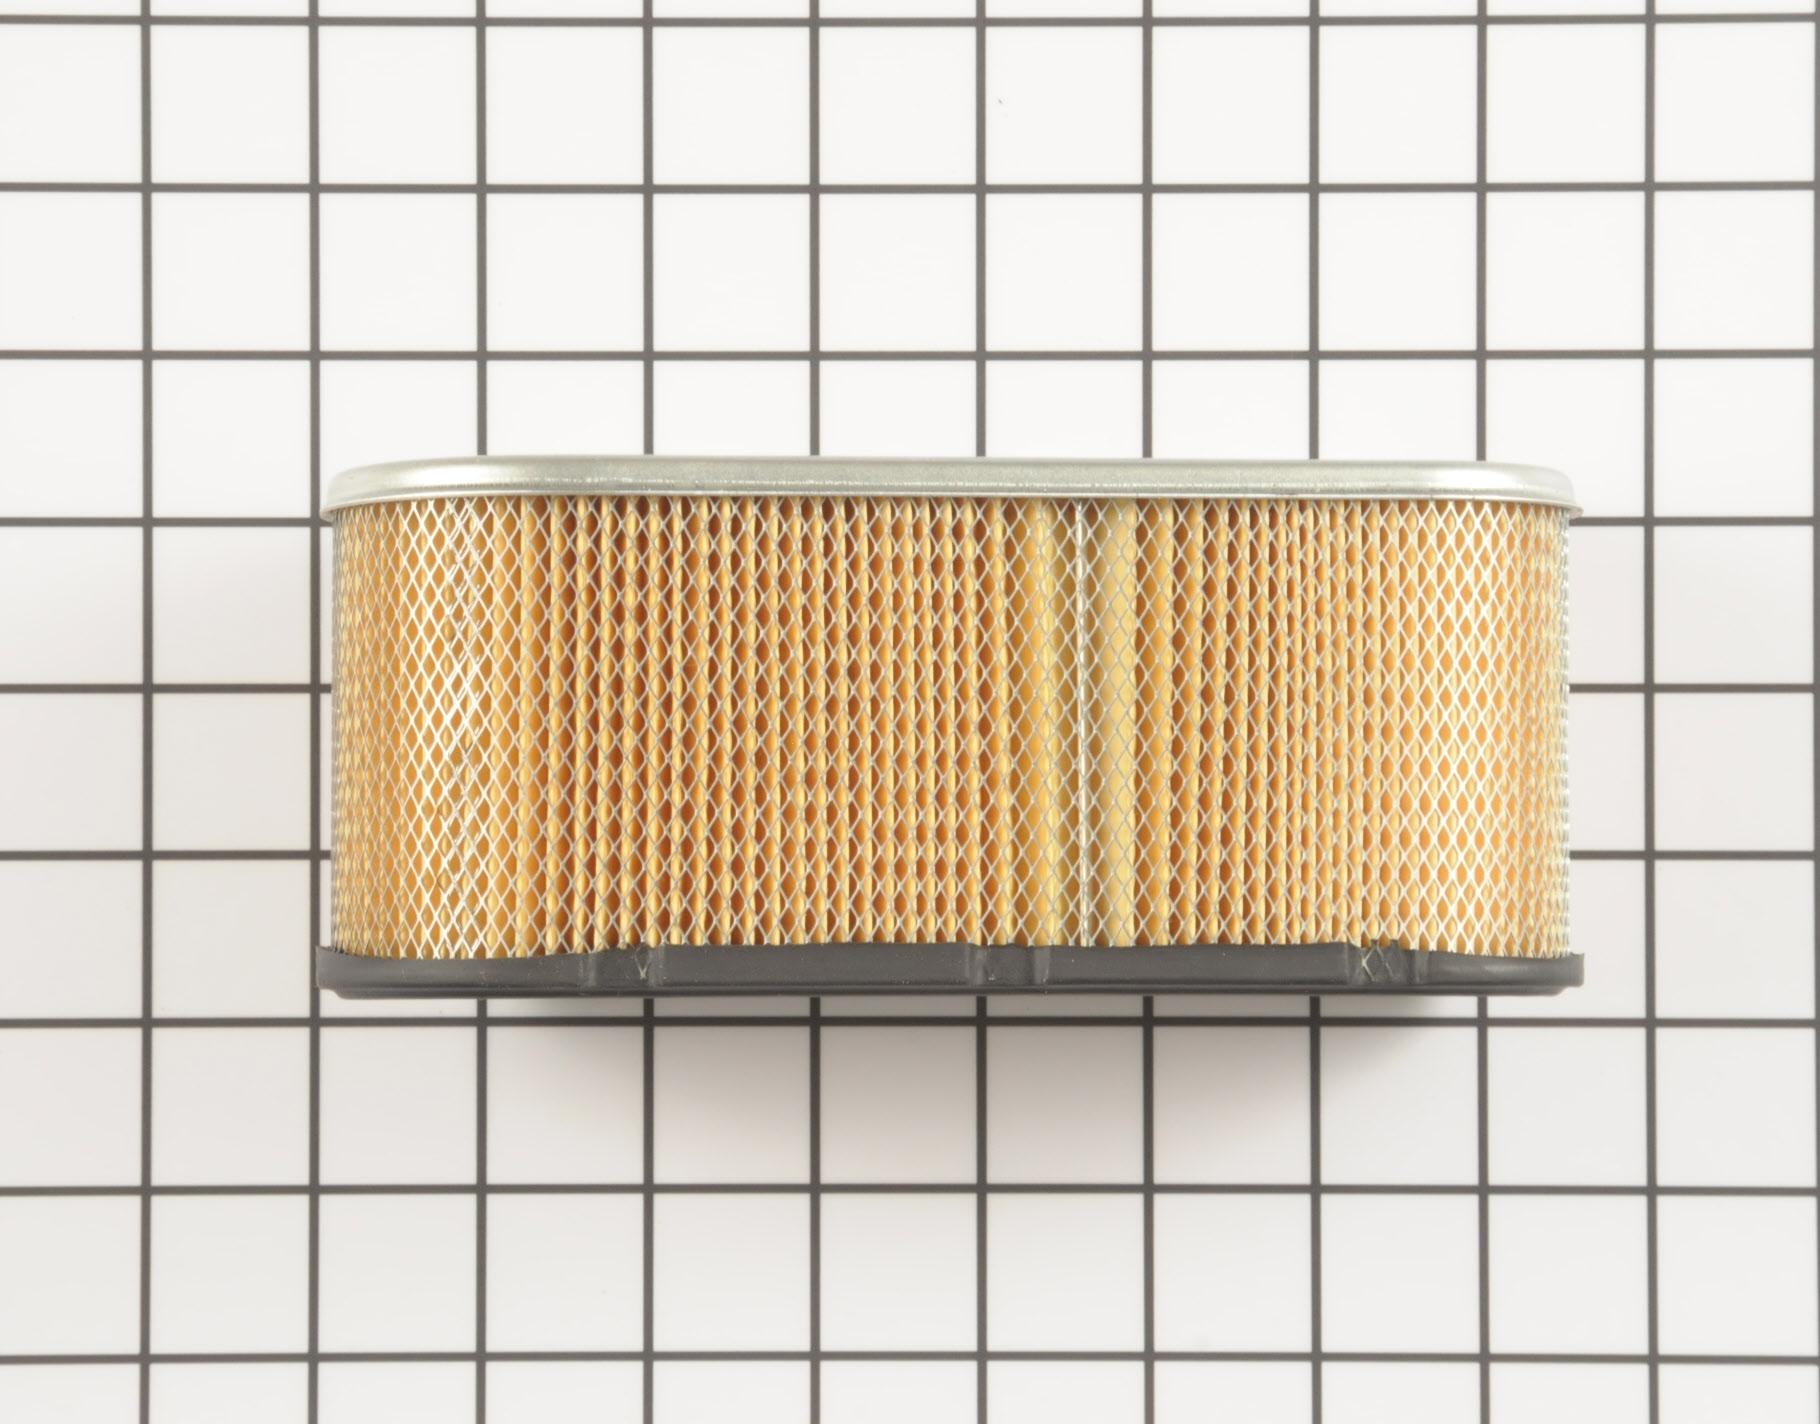 Craftsman Lawn Mower Part # 496894S - Air Filter